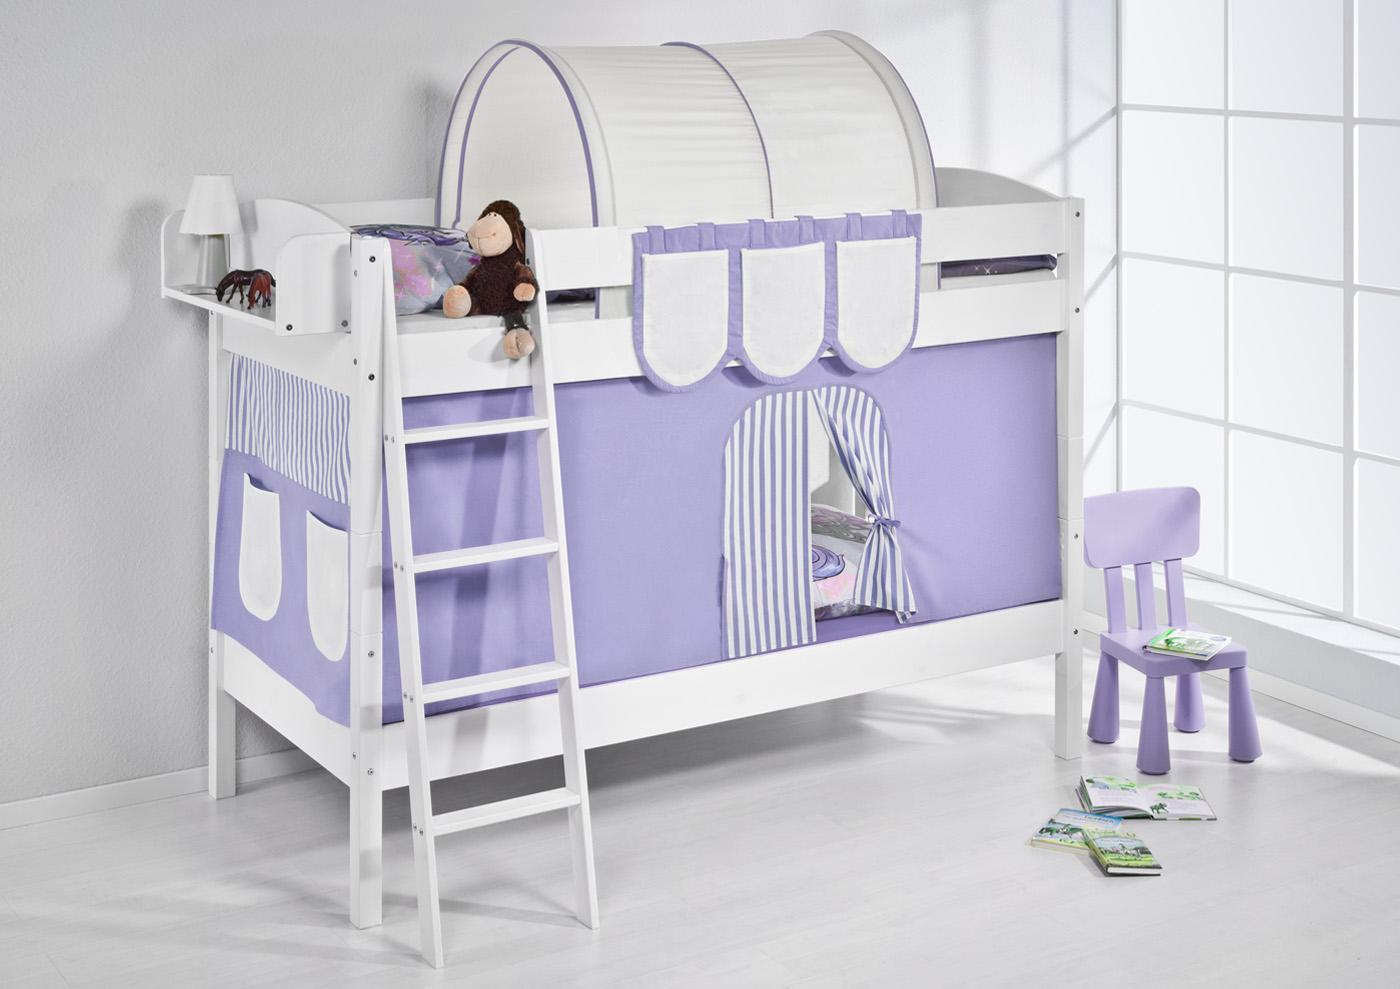 Childrens Bunk Bed Cabin Bed Midsleeper 4105 Lilokids New